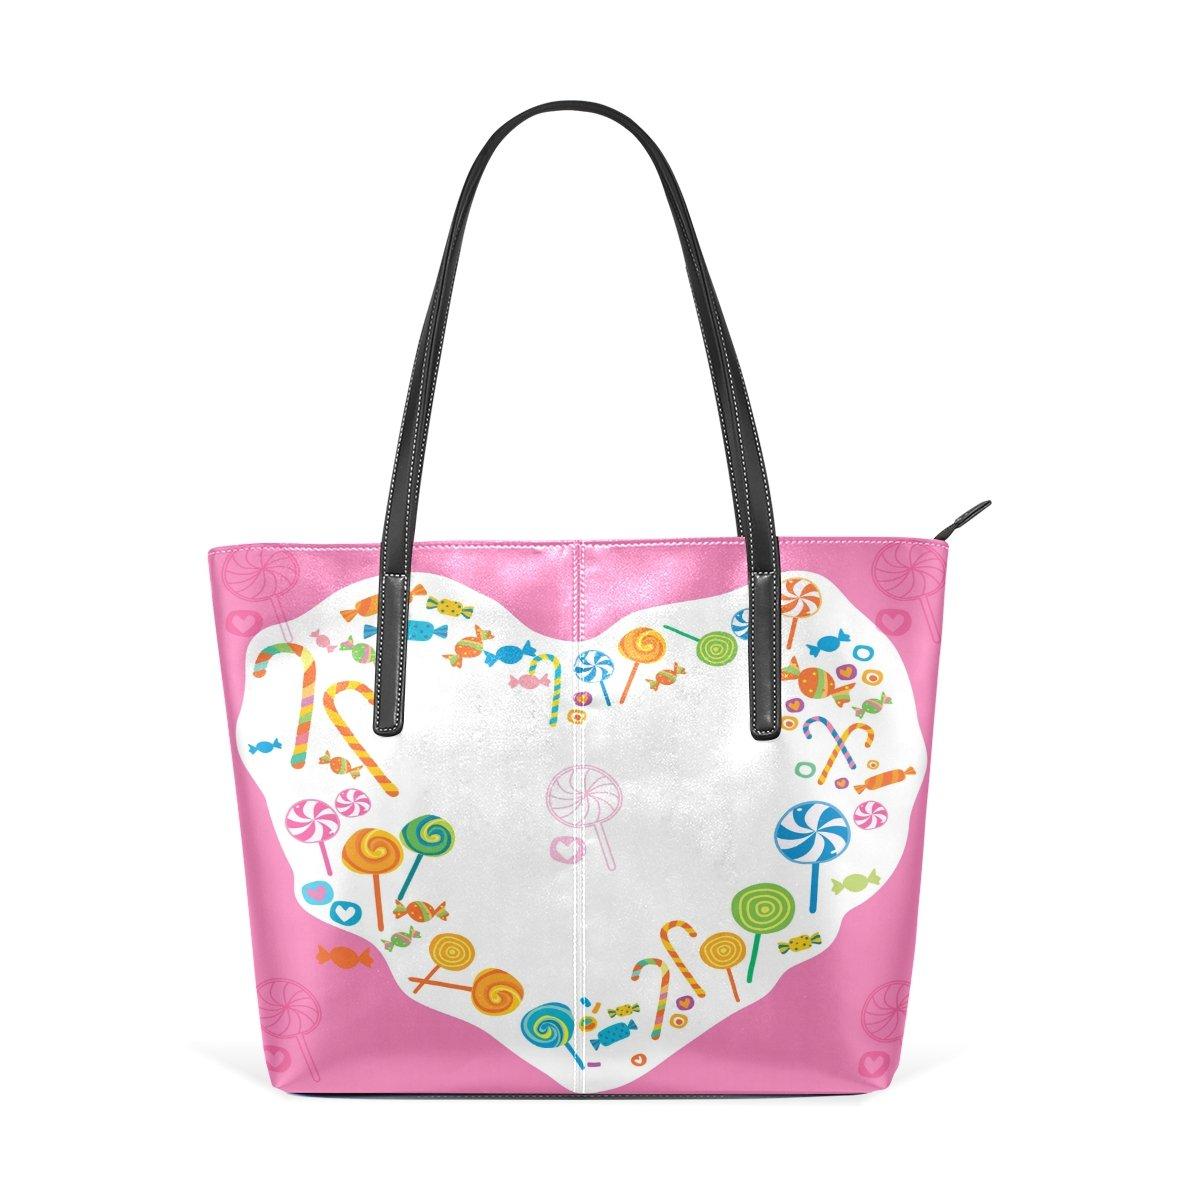 Women Leather Handbags Love Candies Top Handle Shoulder Bags